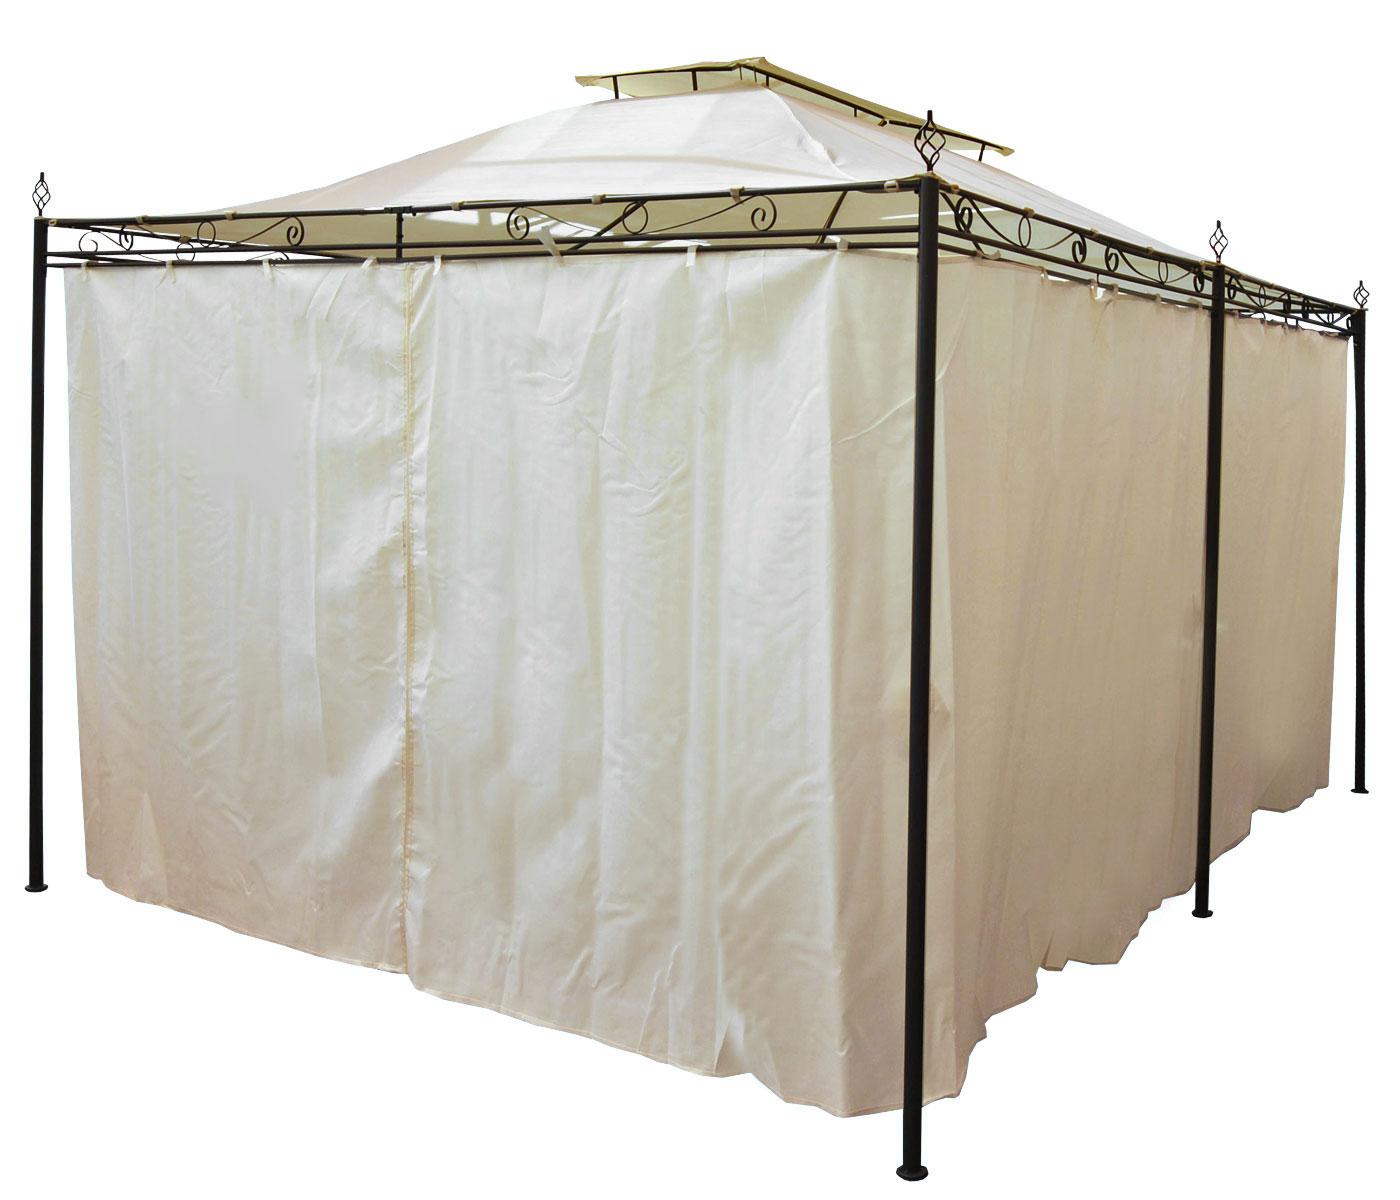 pergola mecina garten pavillon 4cm stahl gestell mit seitenwand 4x3m. Black Bedroom Furniture Sets. Home Design Ideas